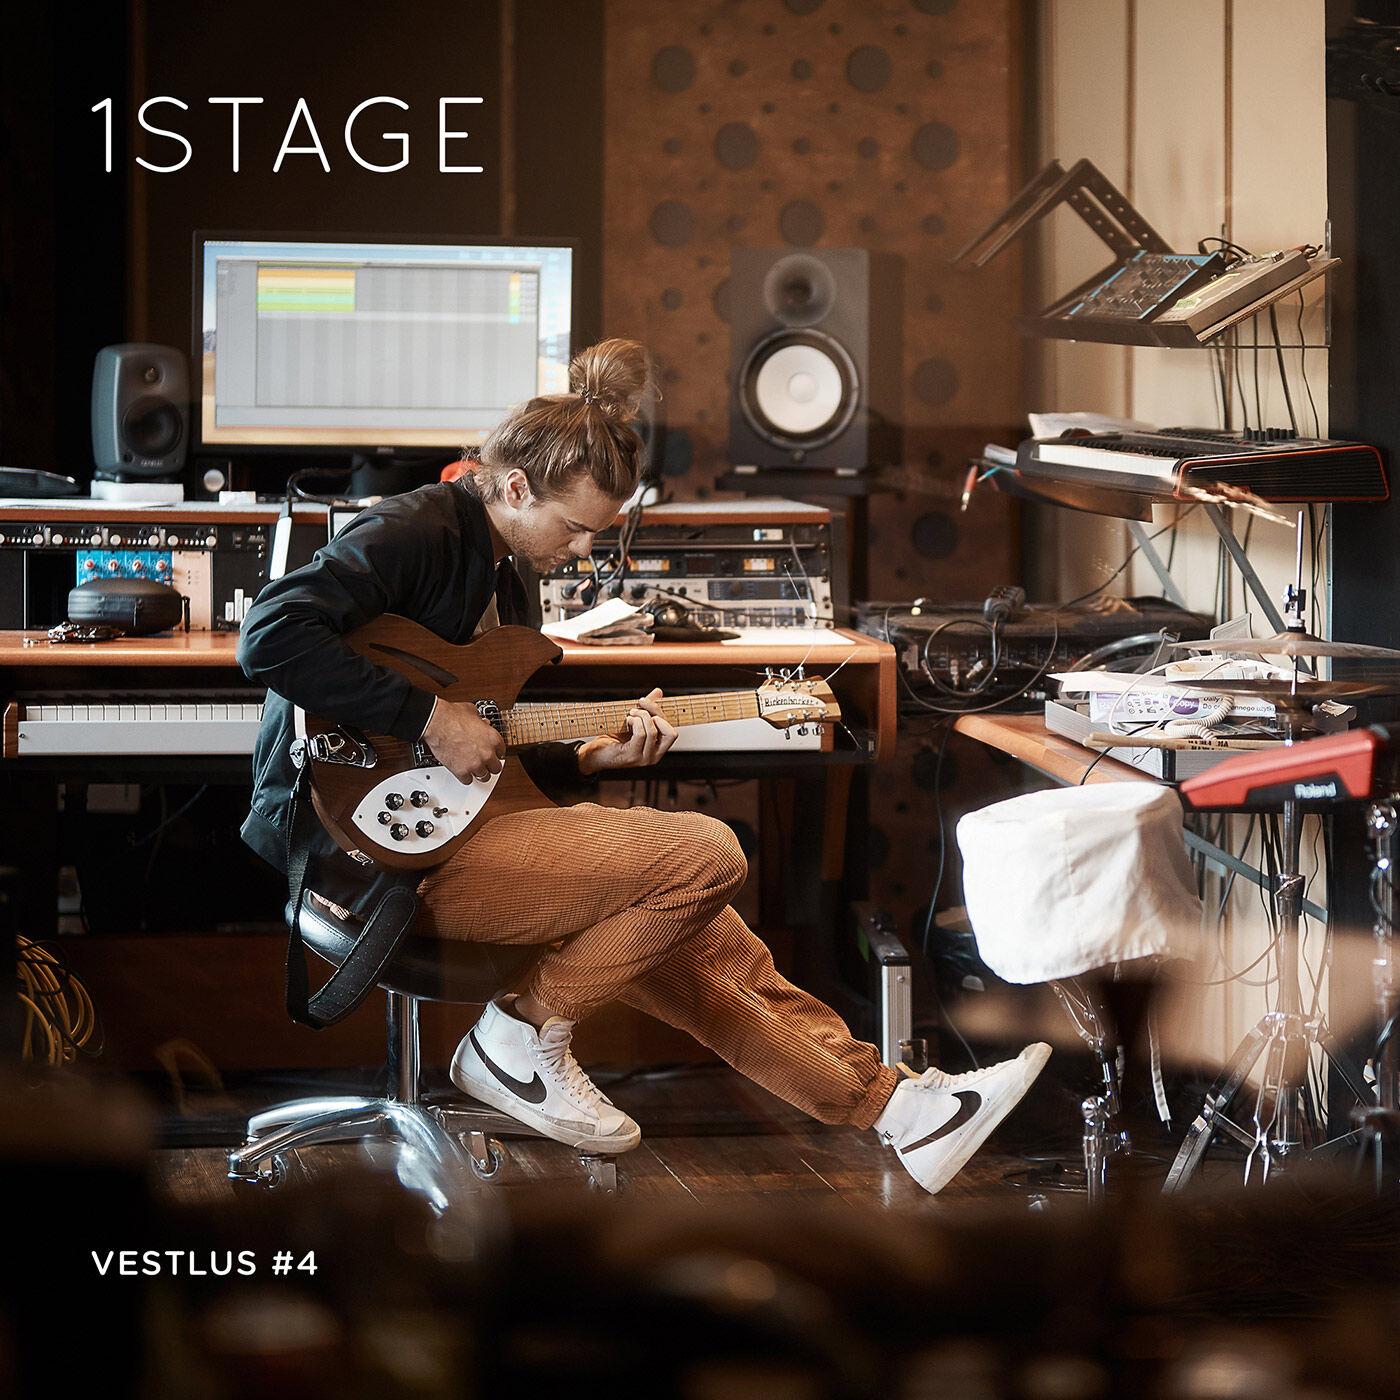 1STAGE VESTLUS #4 - Daniel Levi Viinalass